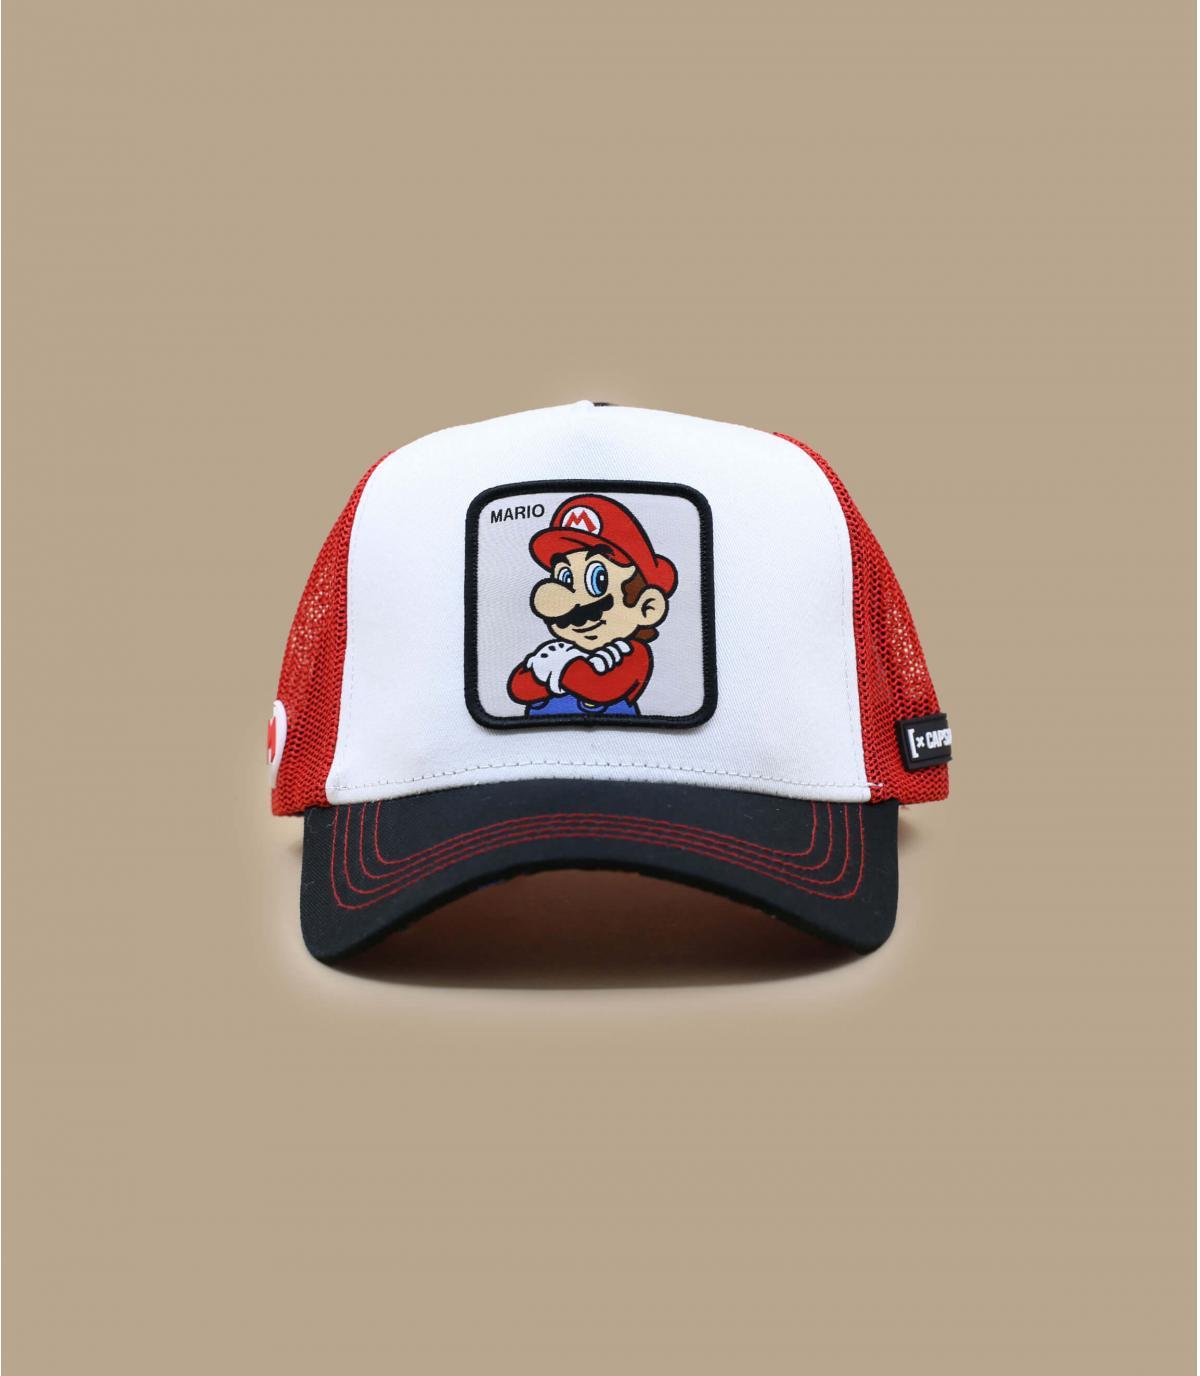 Details Trucker Cap Mario - Abbildung 2